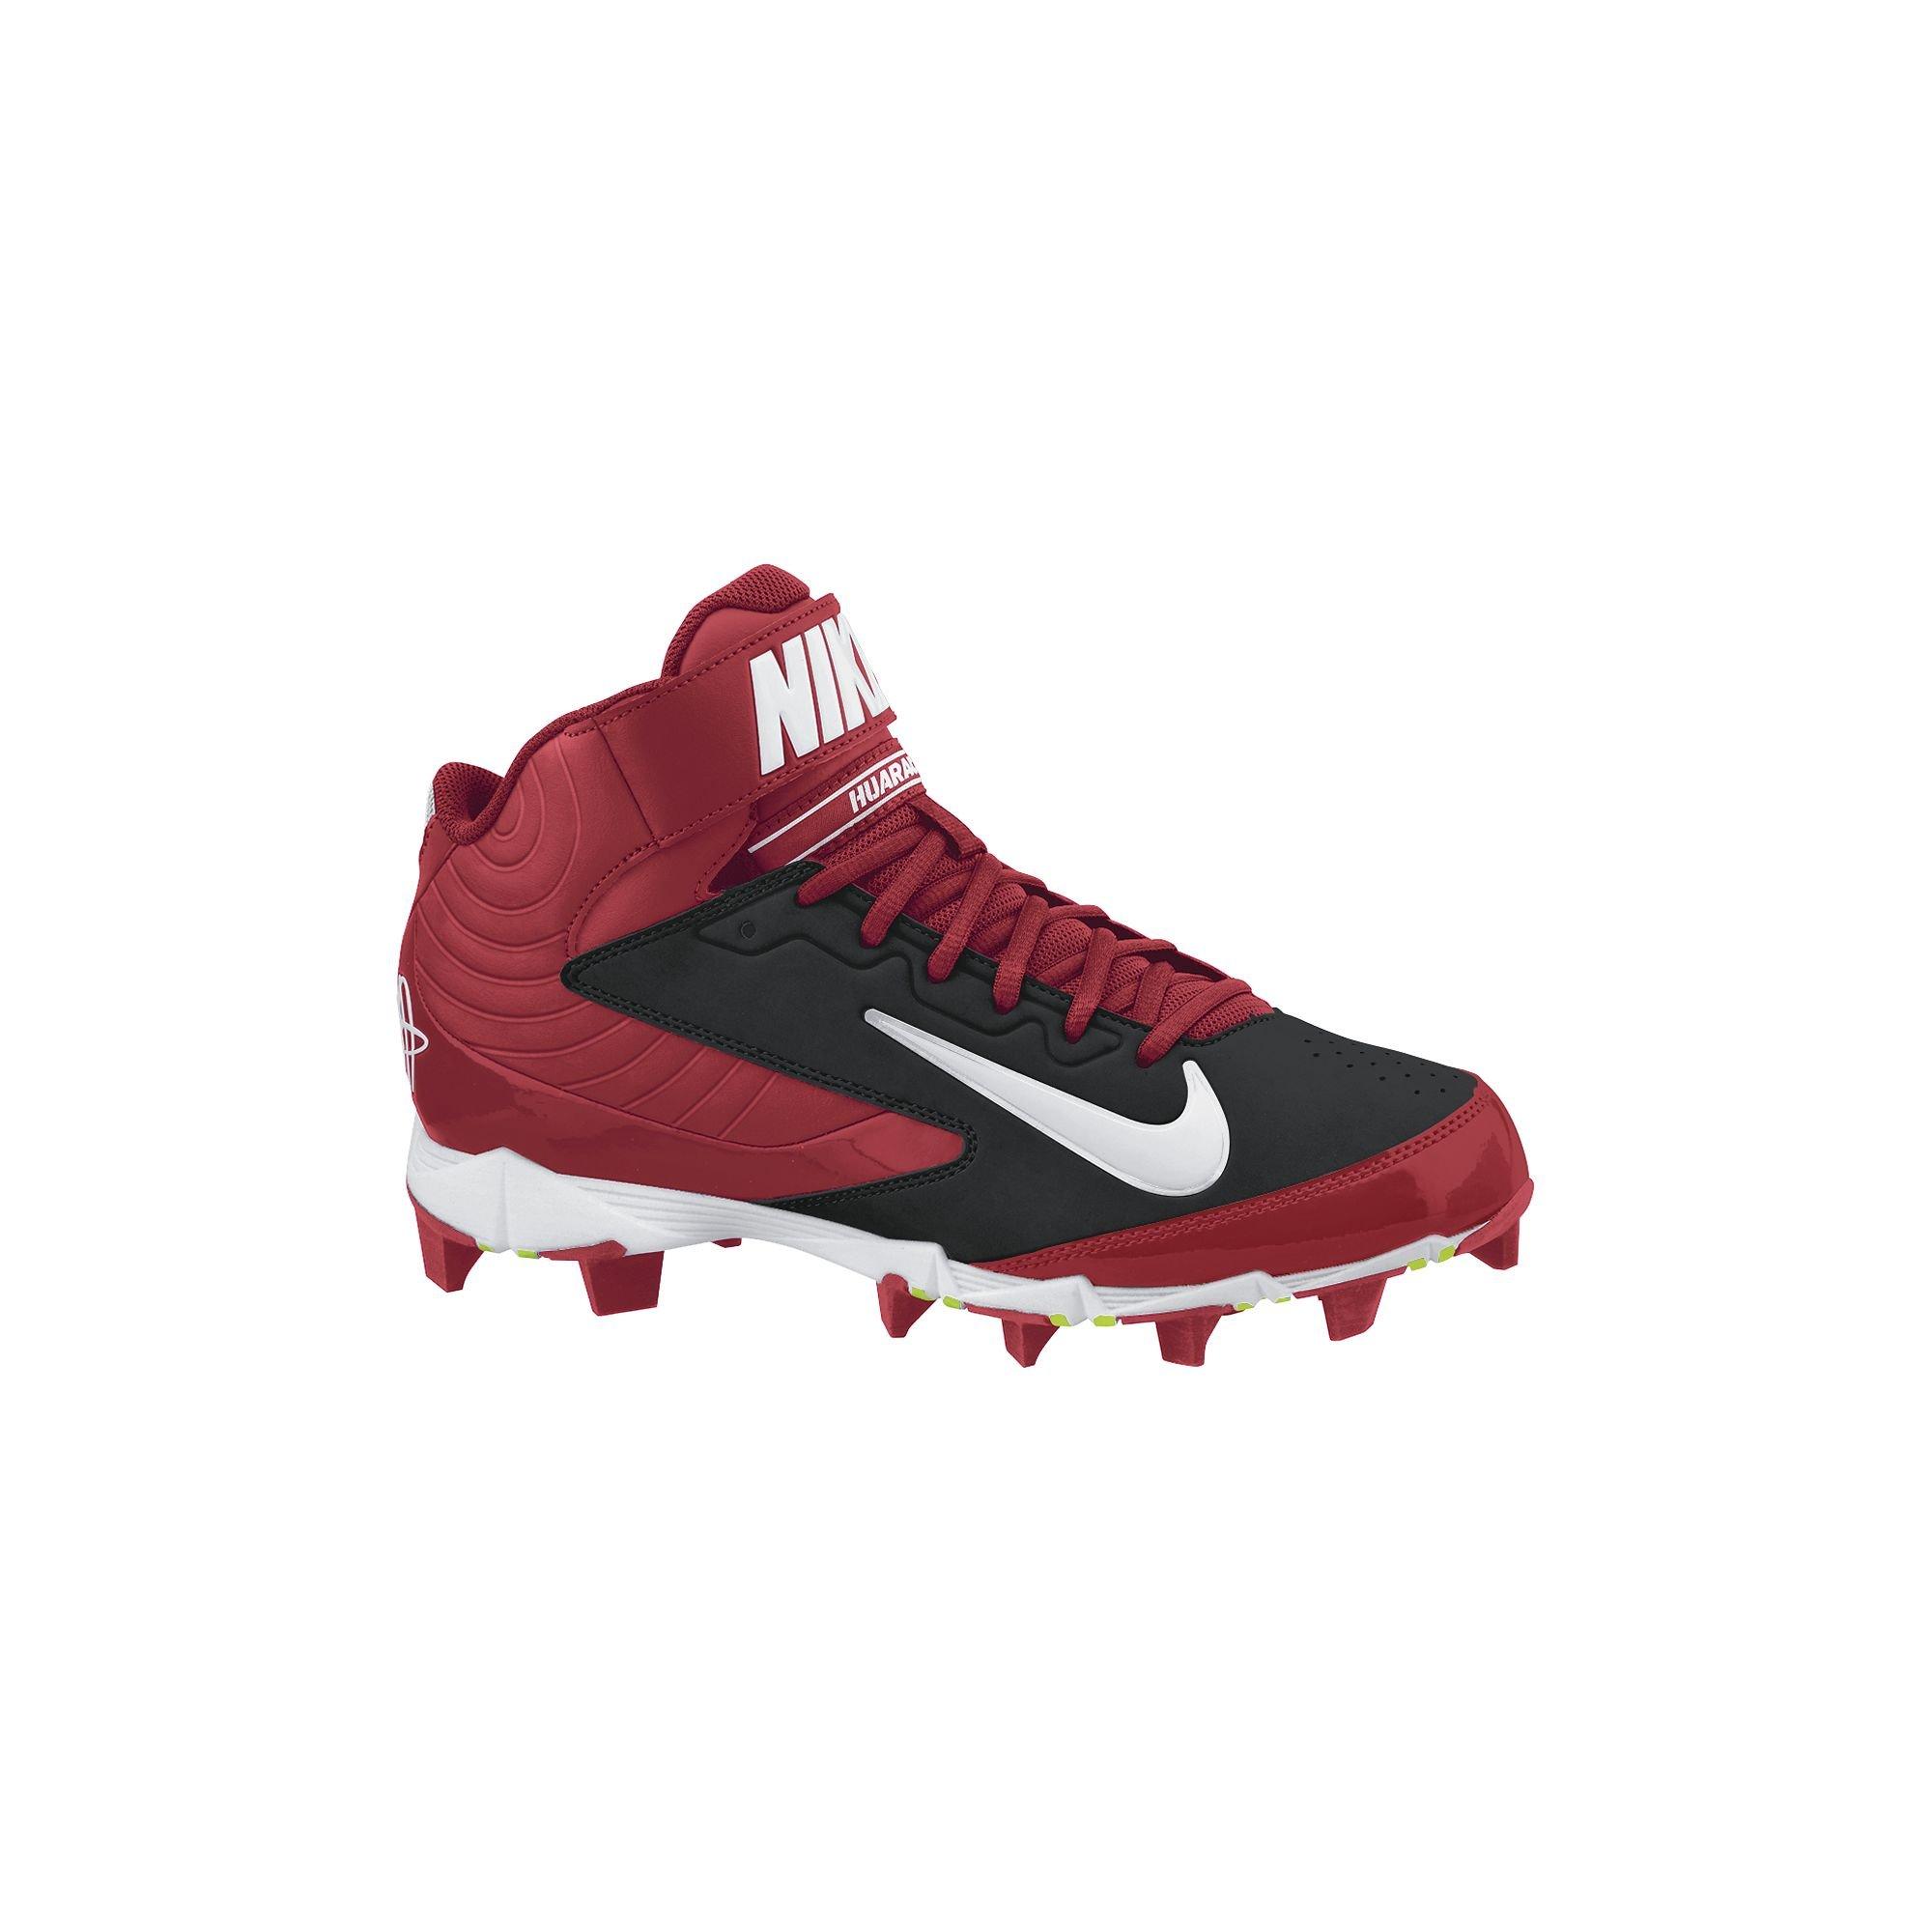 8f1a907355f3 Galleon - Nike Men s Huarache Keystone 3 4 Baseball Cleat Black Varsity Red White  Size 11.5 M US